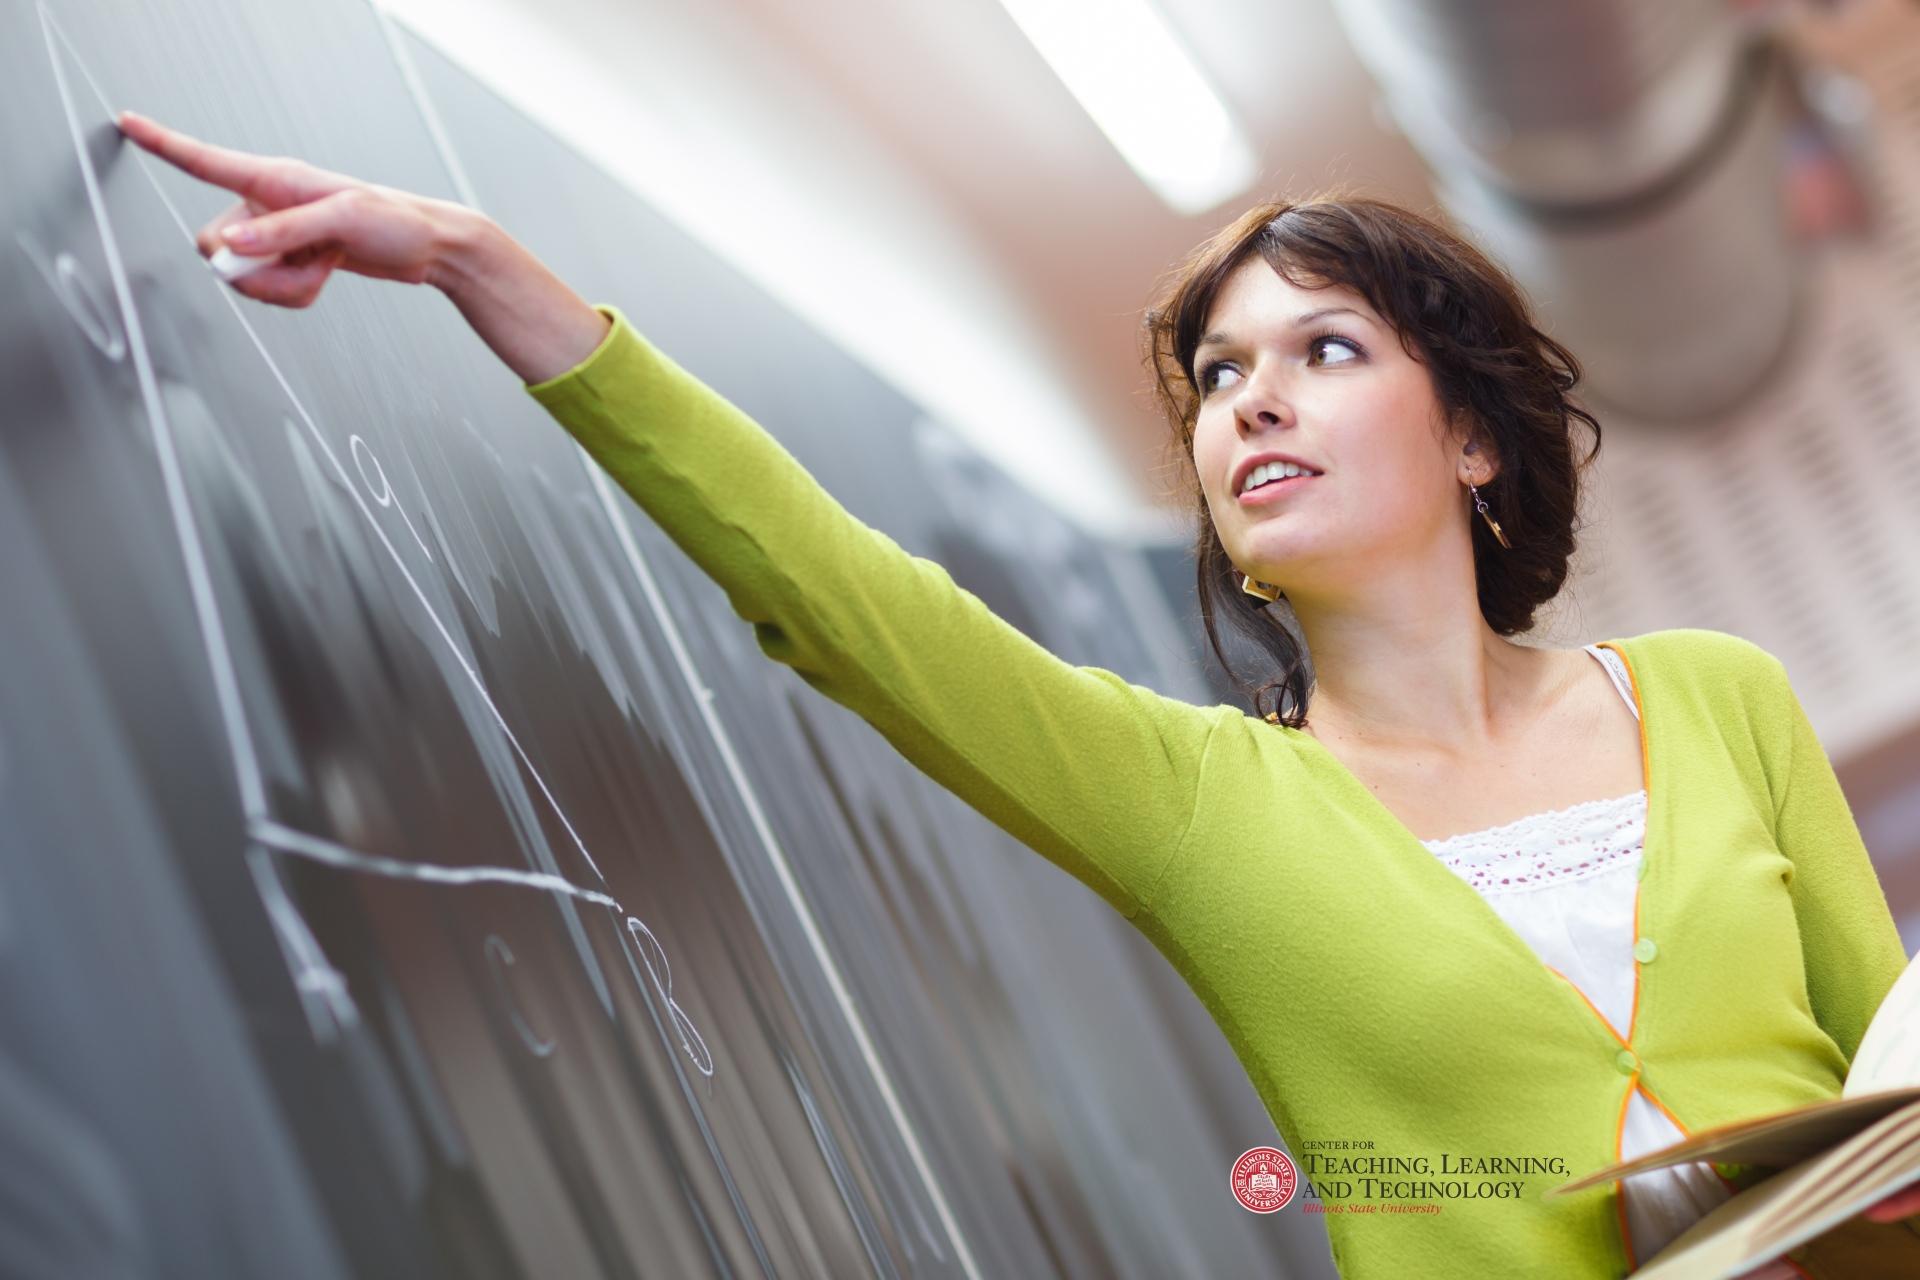 Teacher pointing at chalkboard